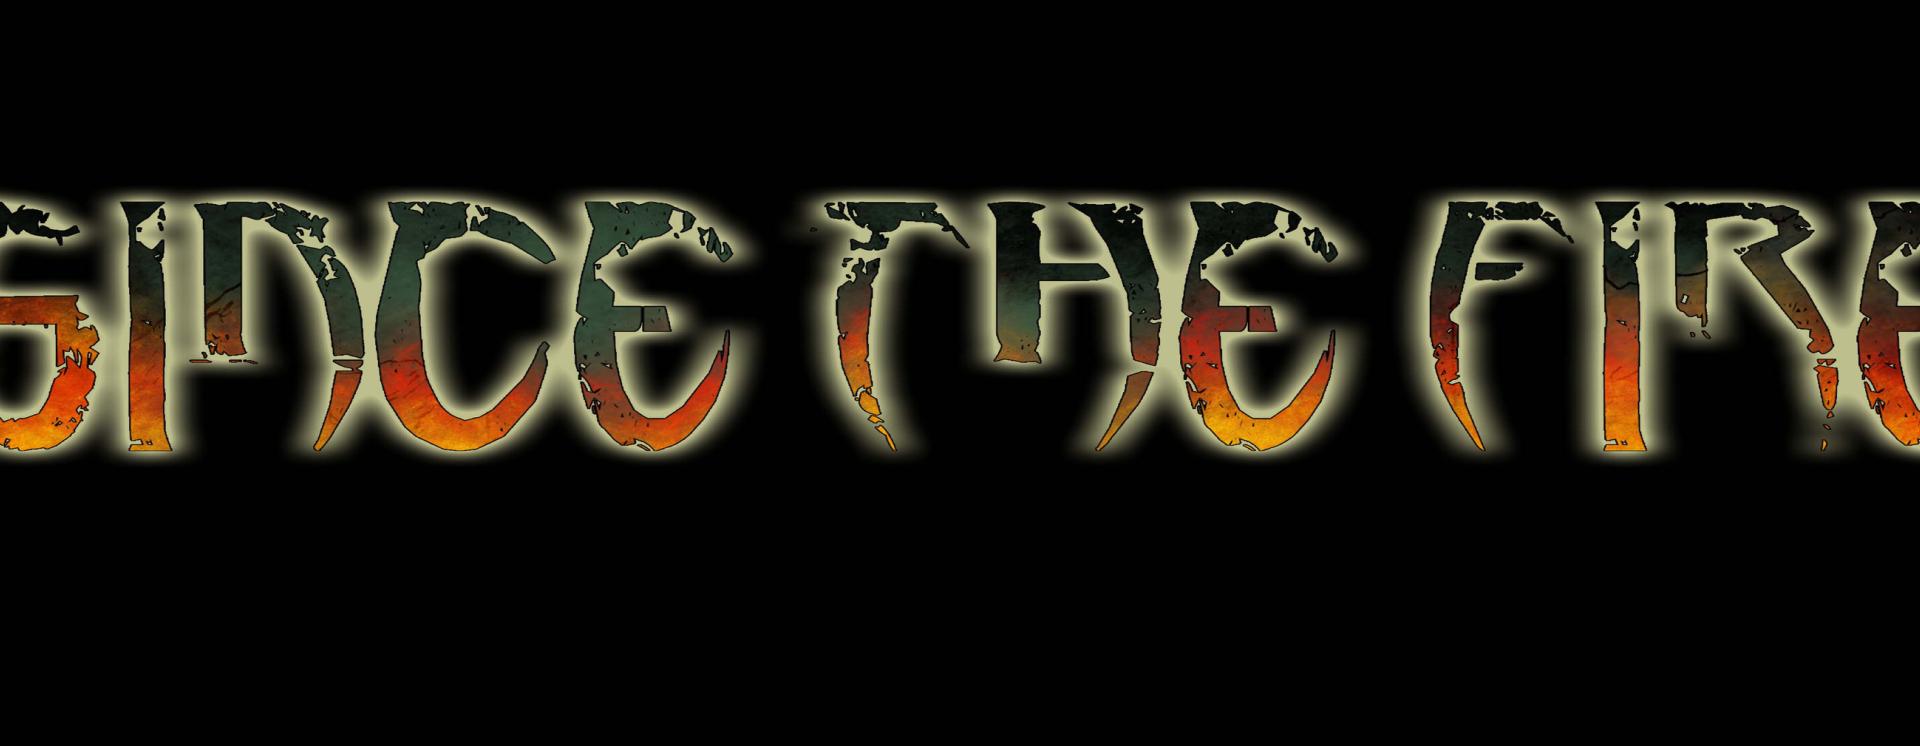 1455599001 stf new logo banner copy